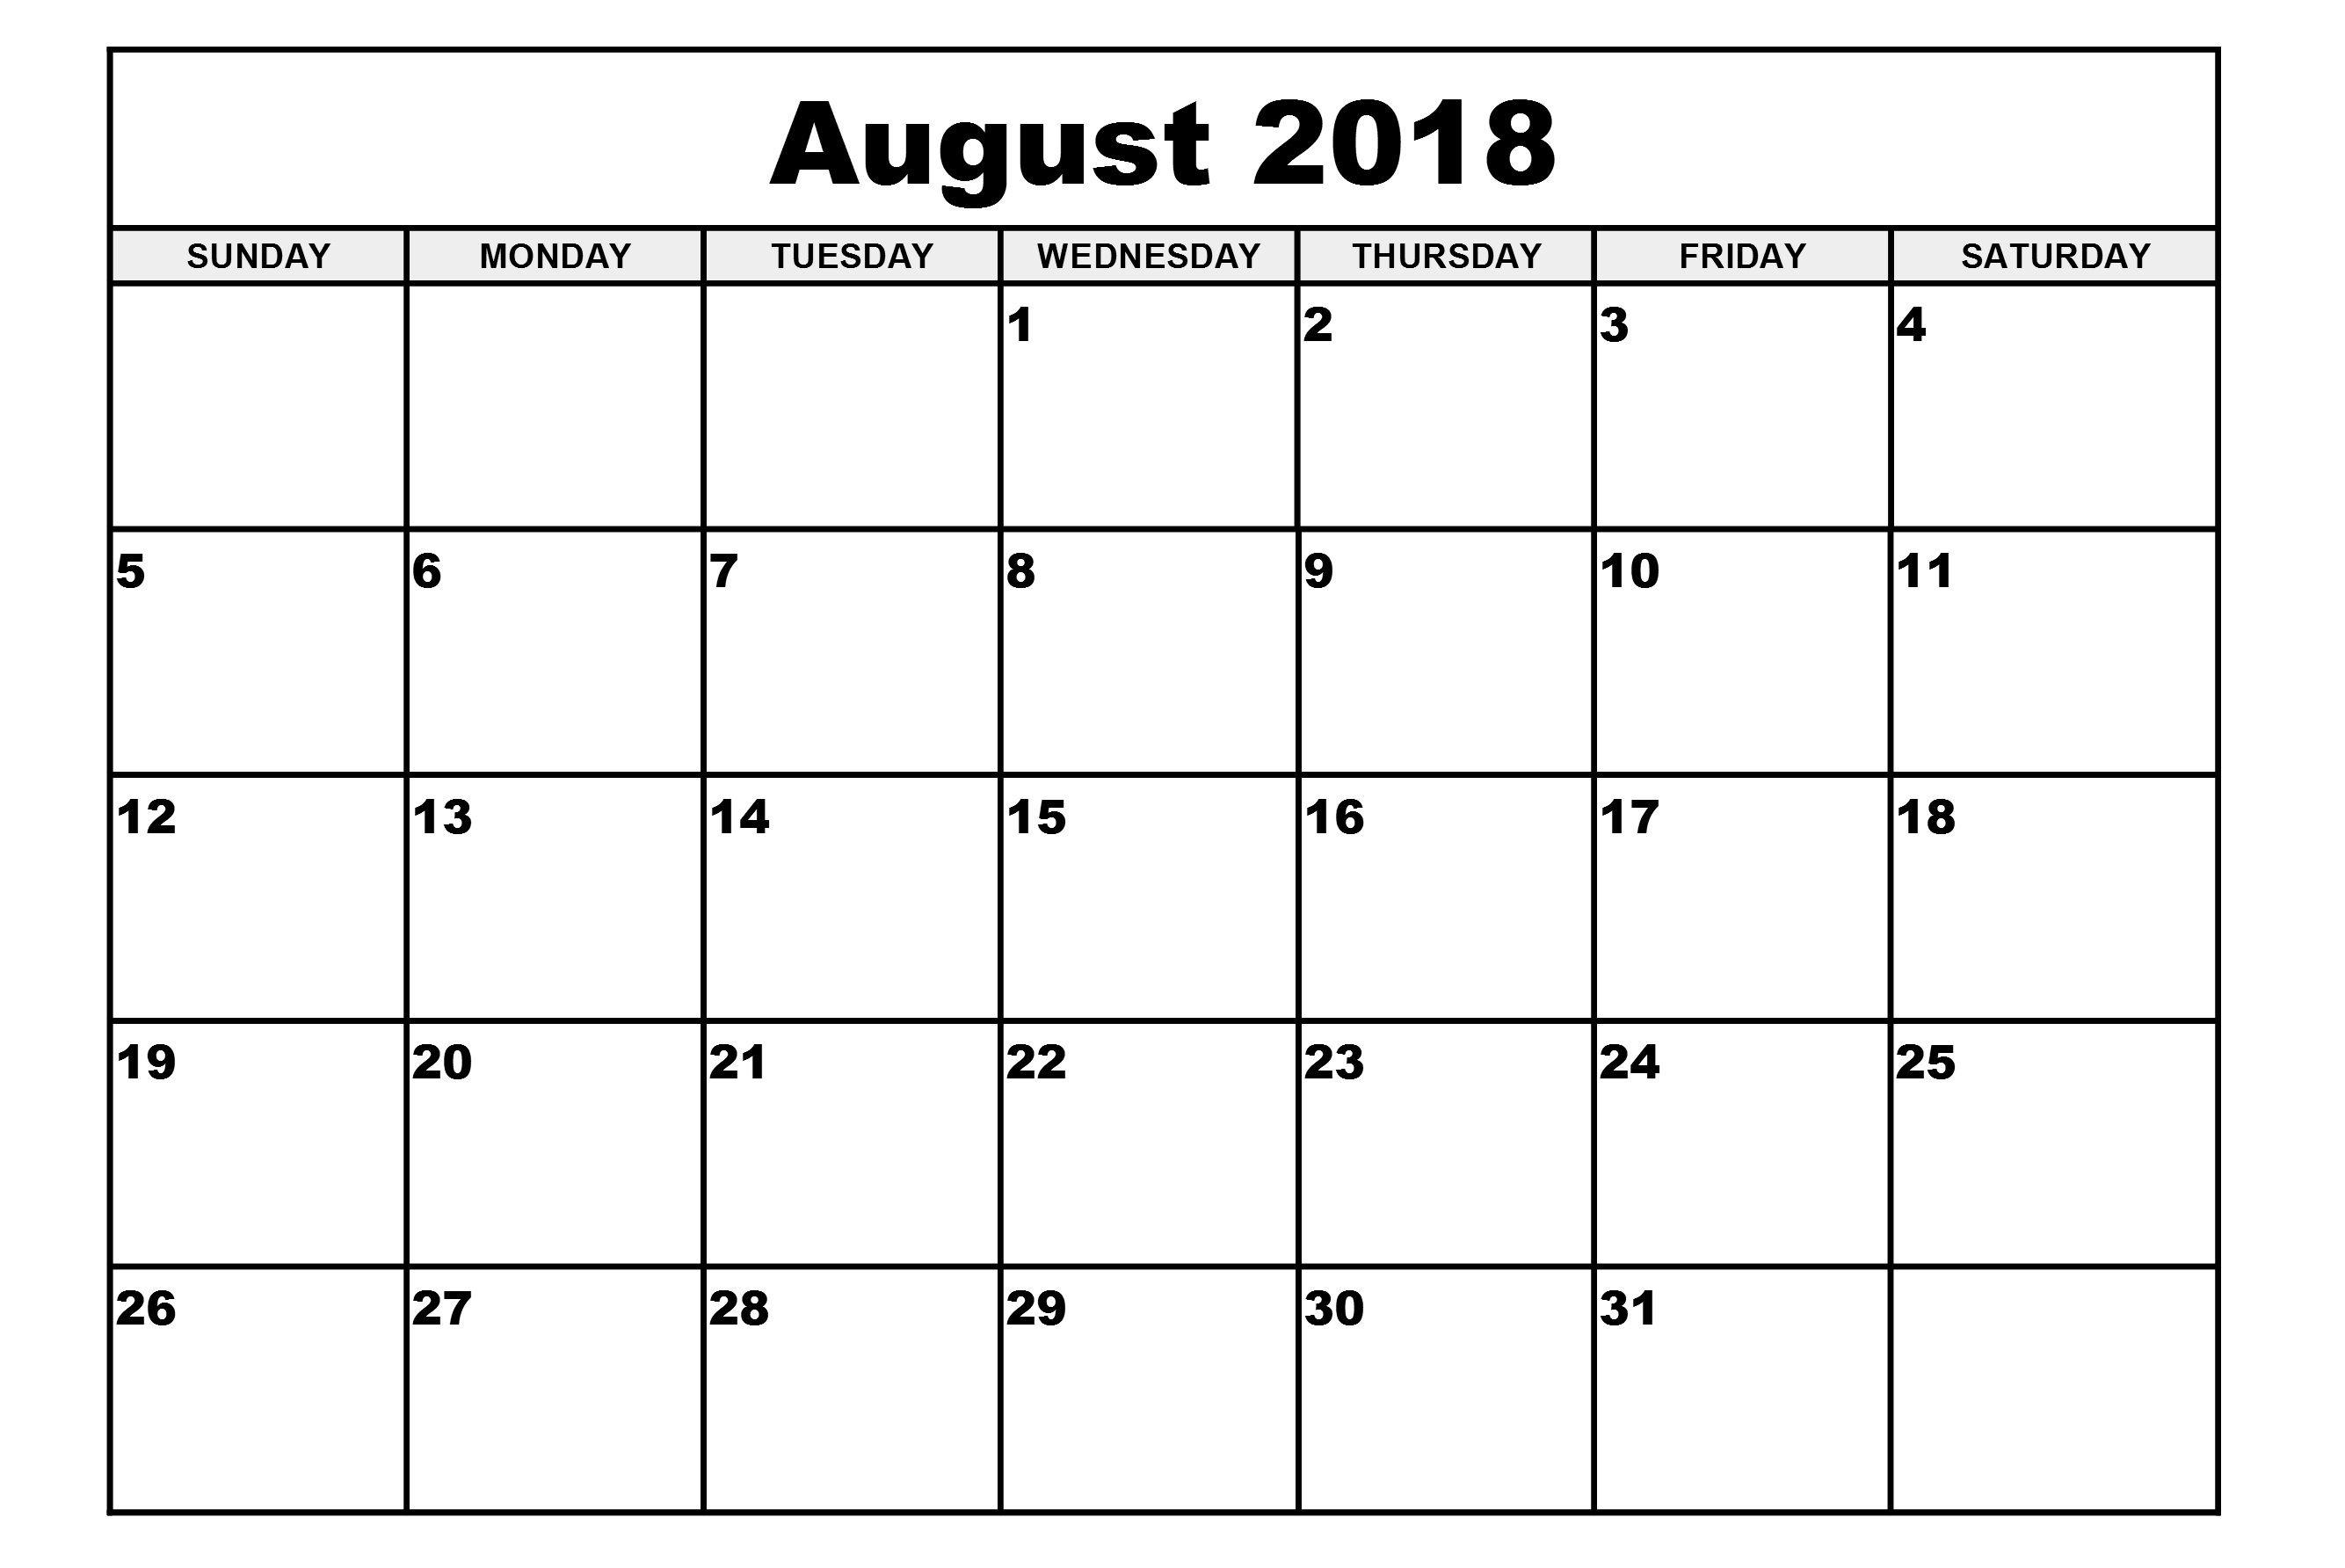 August Calendar 2018 Printable Simple Blank Template   August regarding Blank Calendar August Template Australia